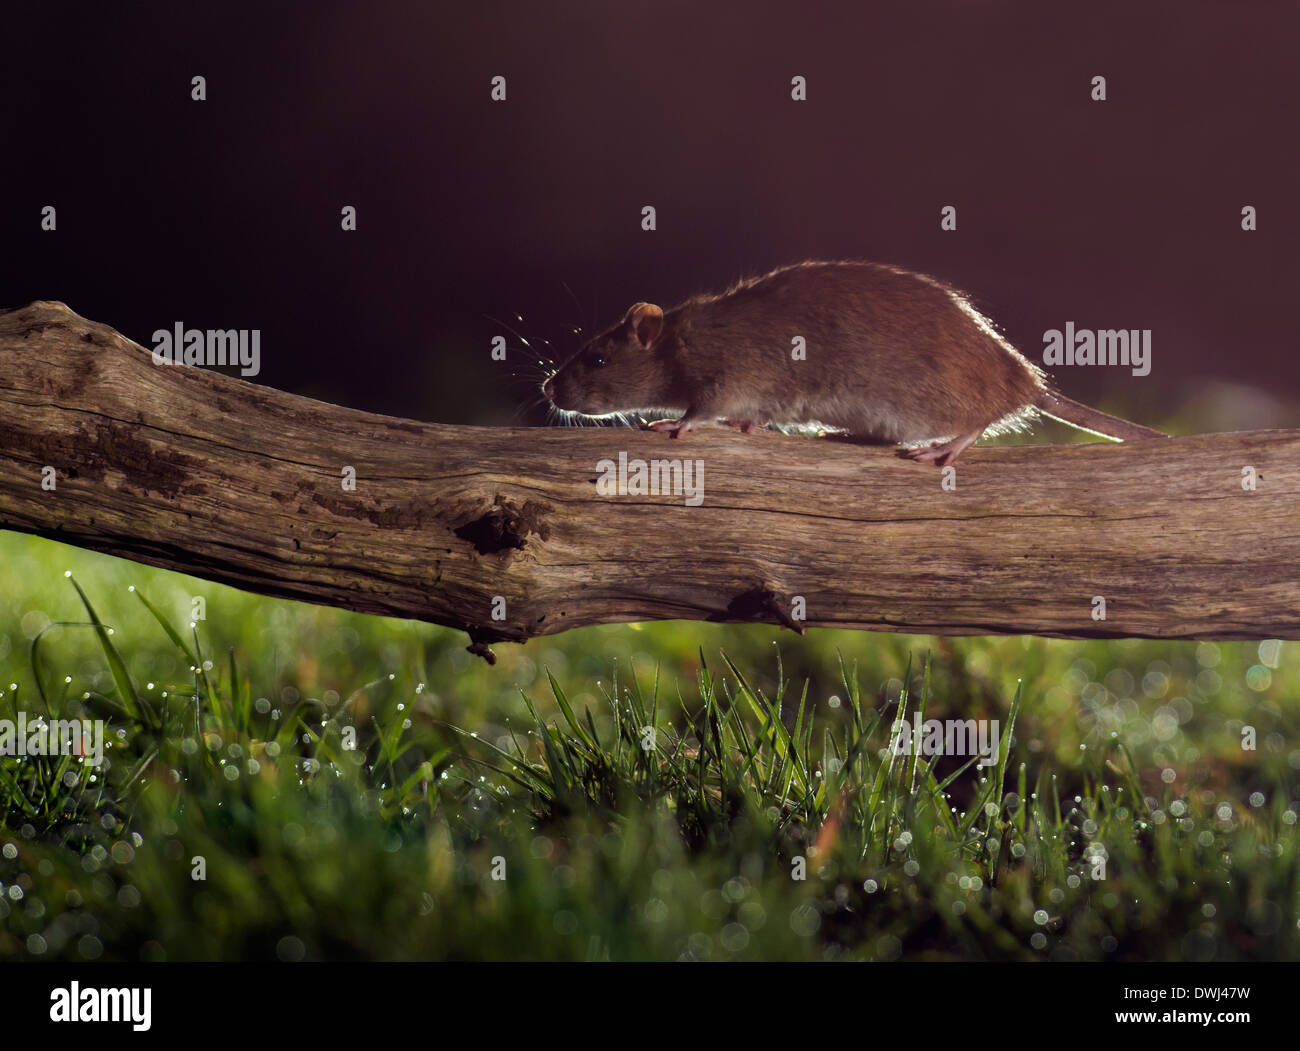 Brown Rat (Rattus norvegicus) running along fallen tree branch at night - Stock Image